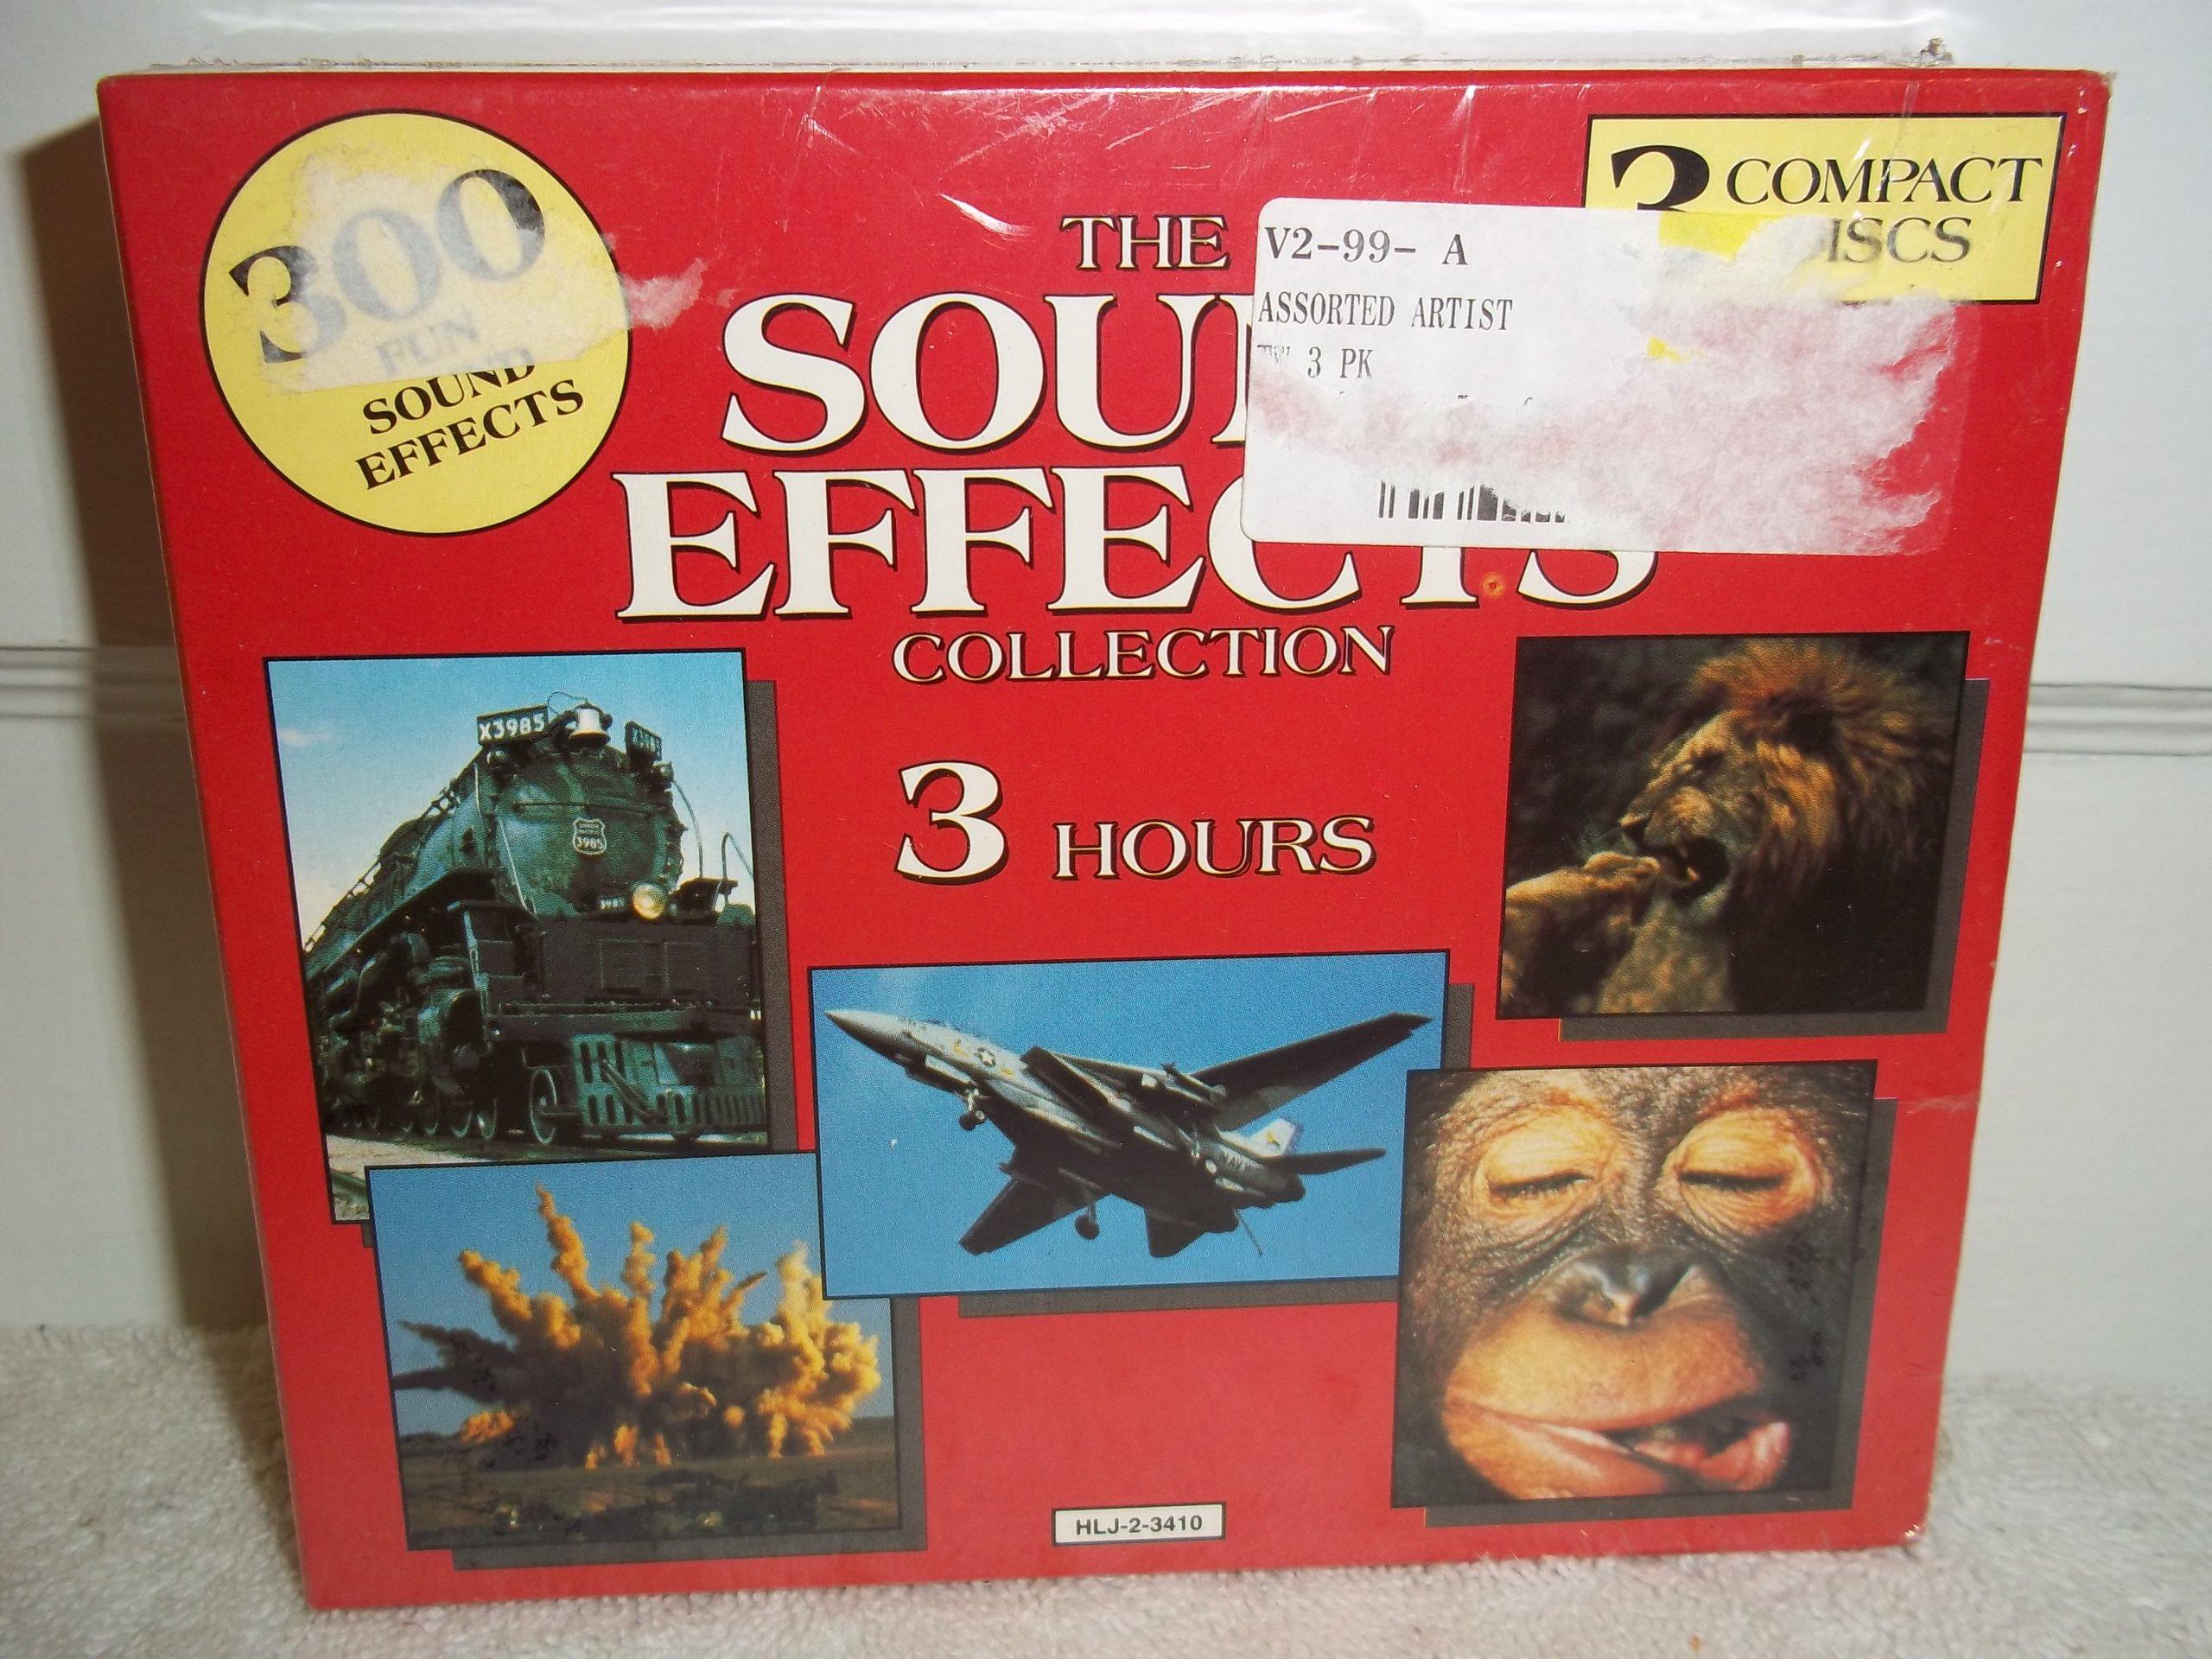 100 Sound Effects, Vol.1 - Cd, 1993